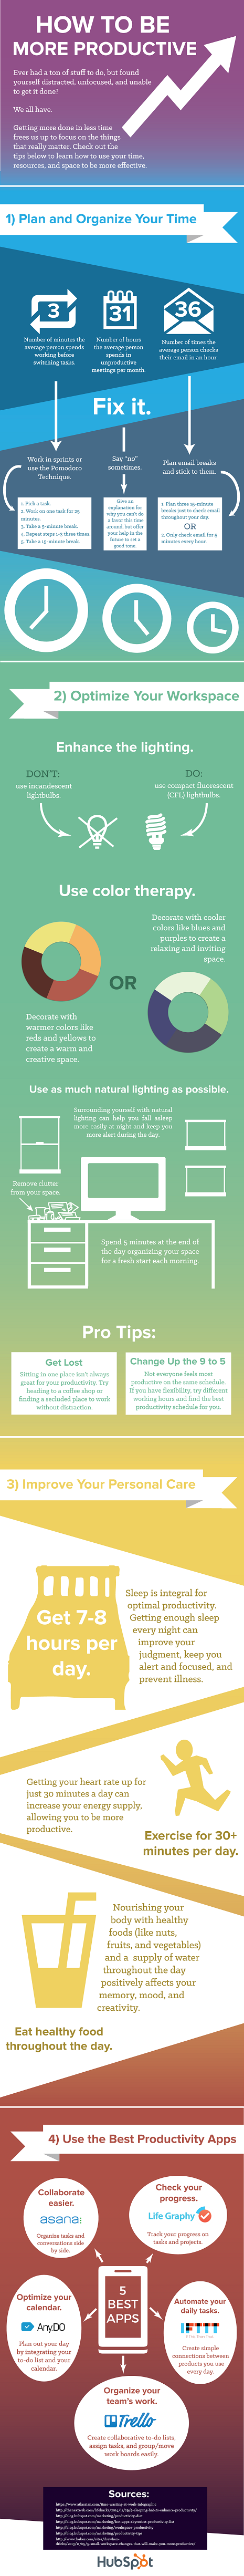 Productivity-Infographic pq